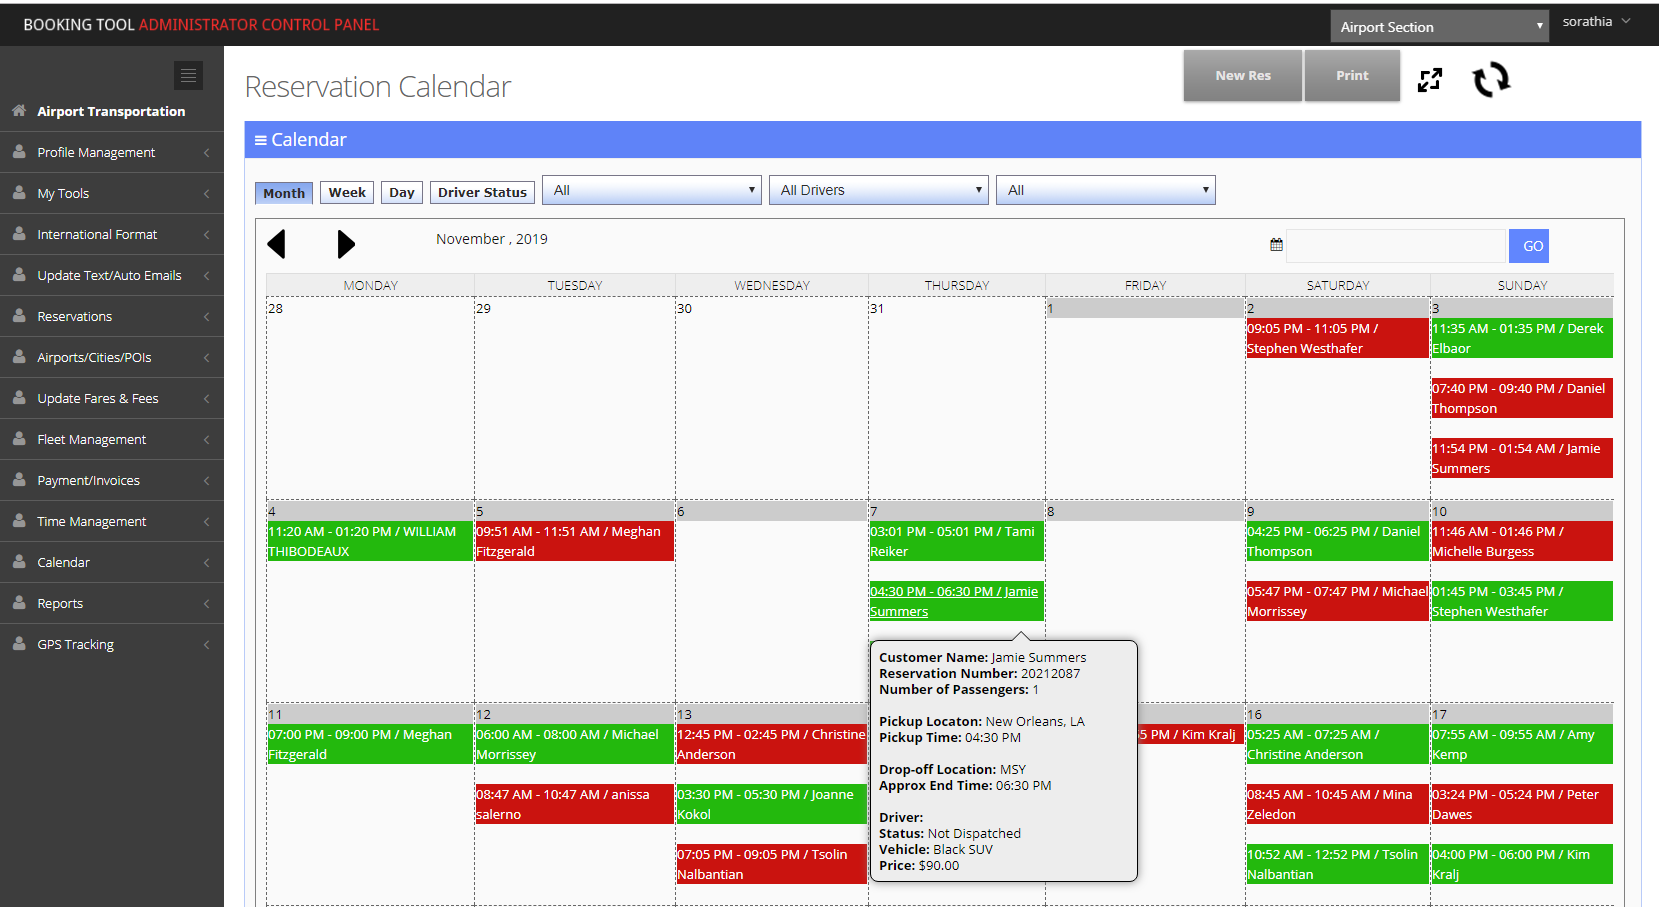 The Booking Tool reservation calendar screenshot